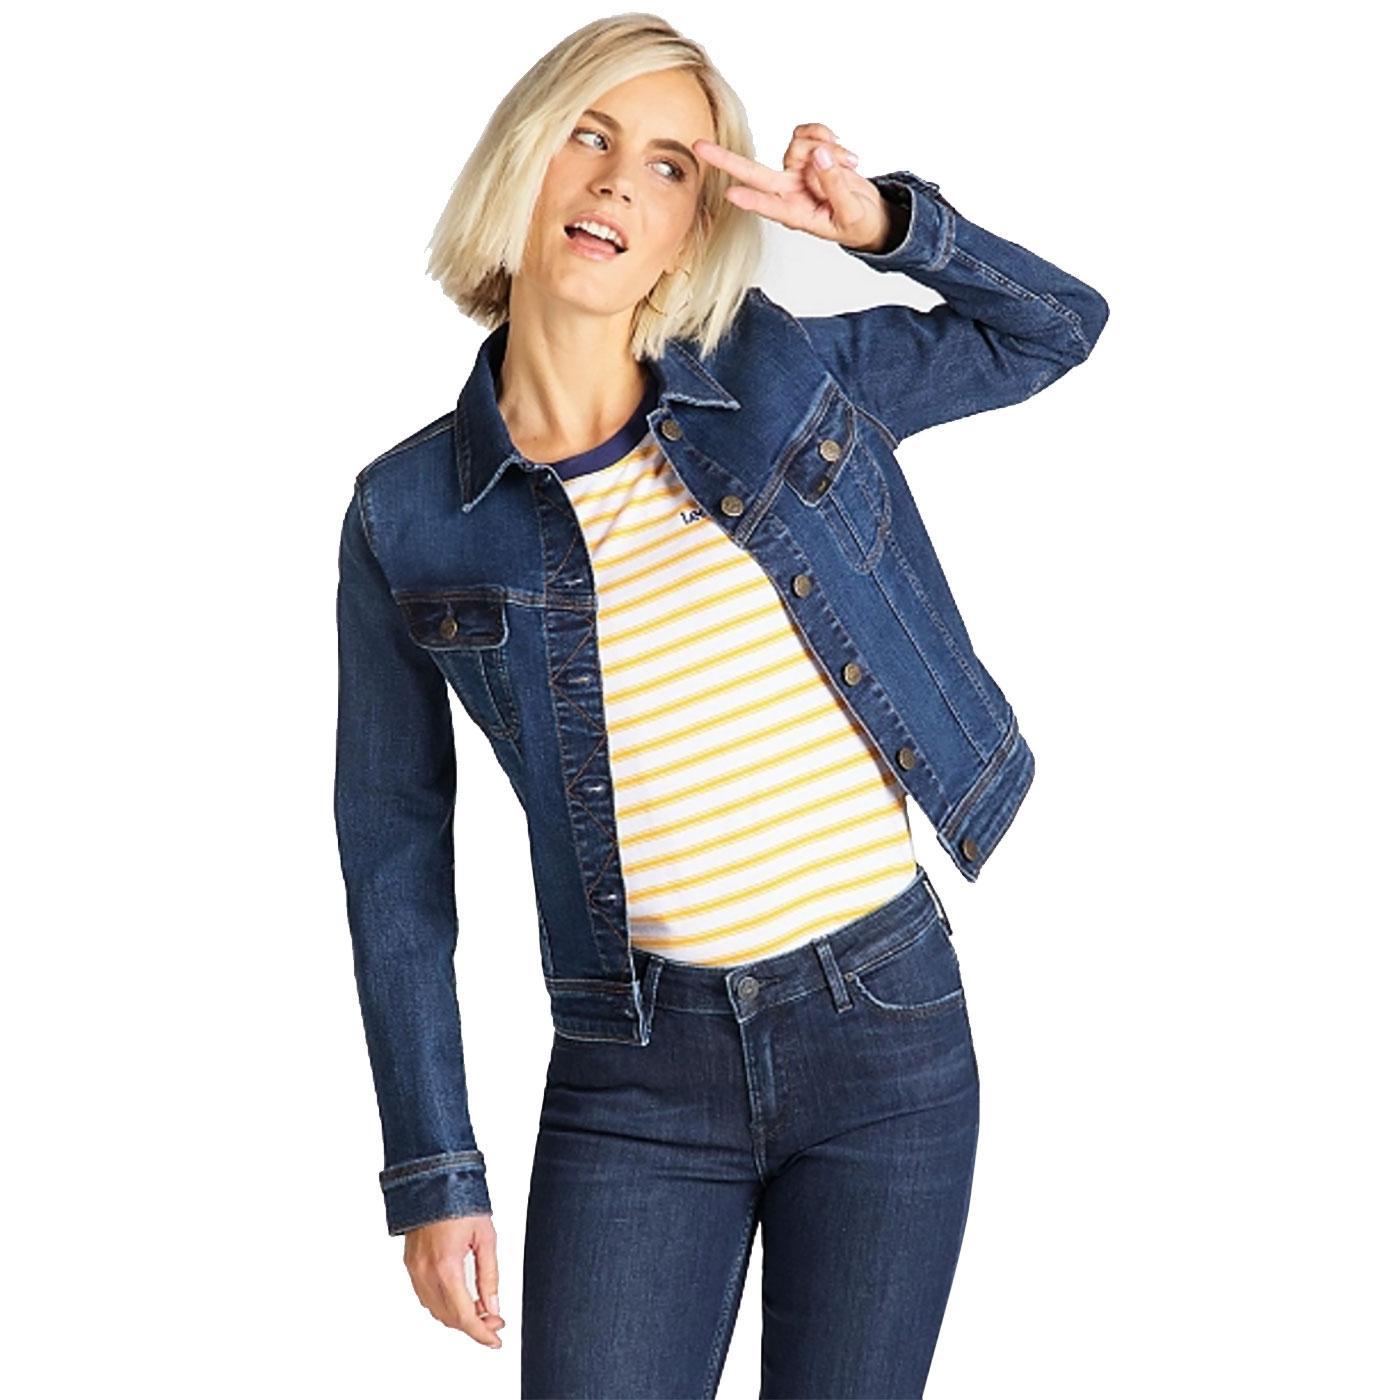 LEE Slim Rider Womens Retro Denim Jacket DARK HUNT